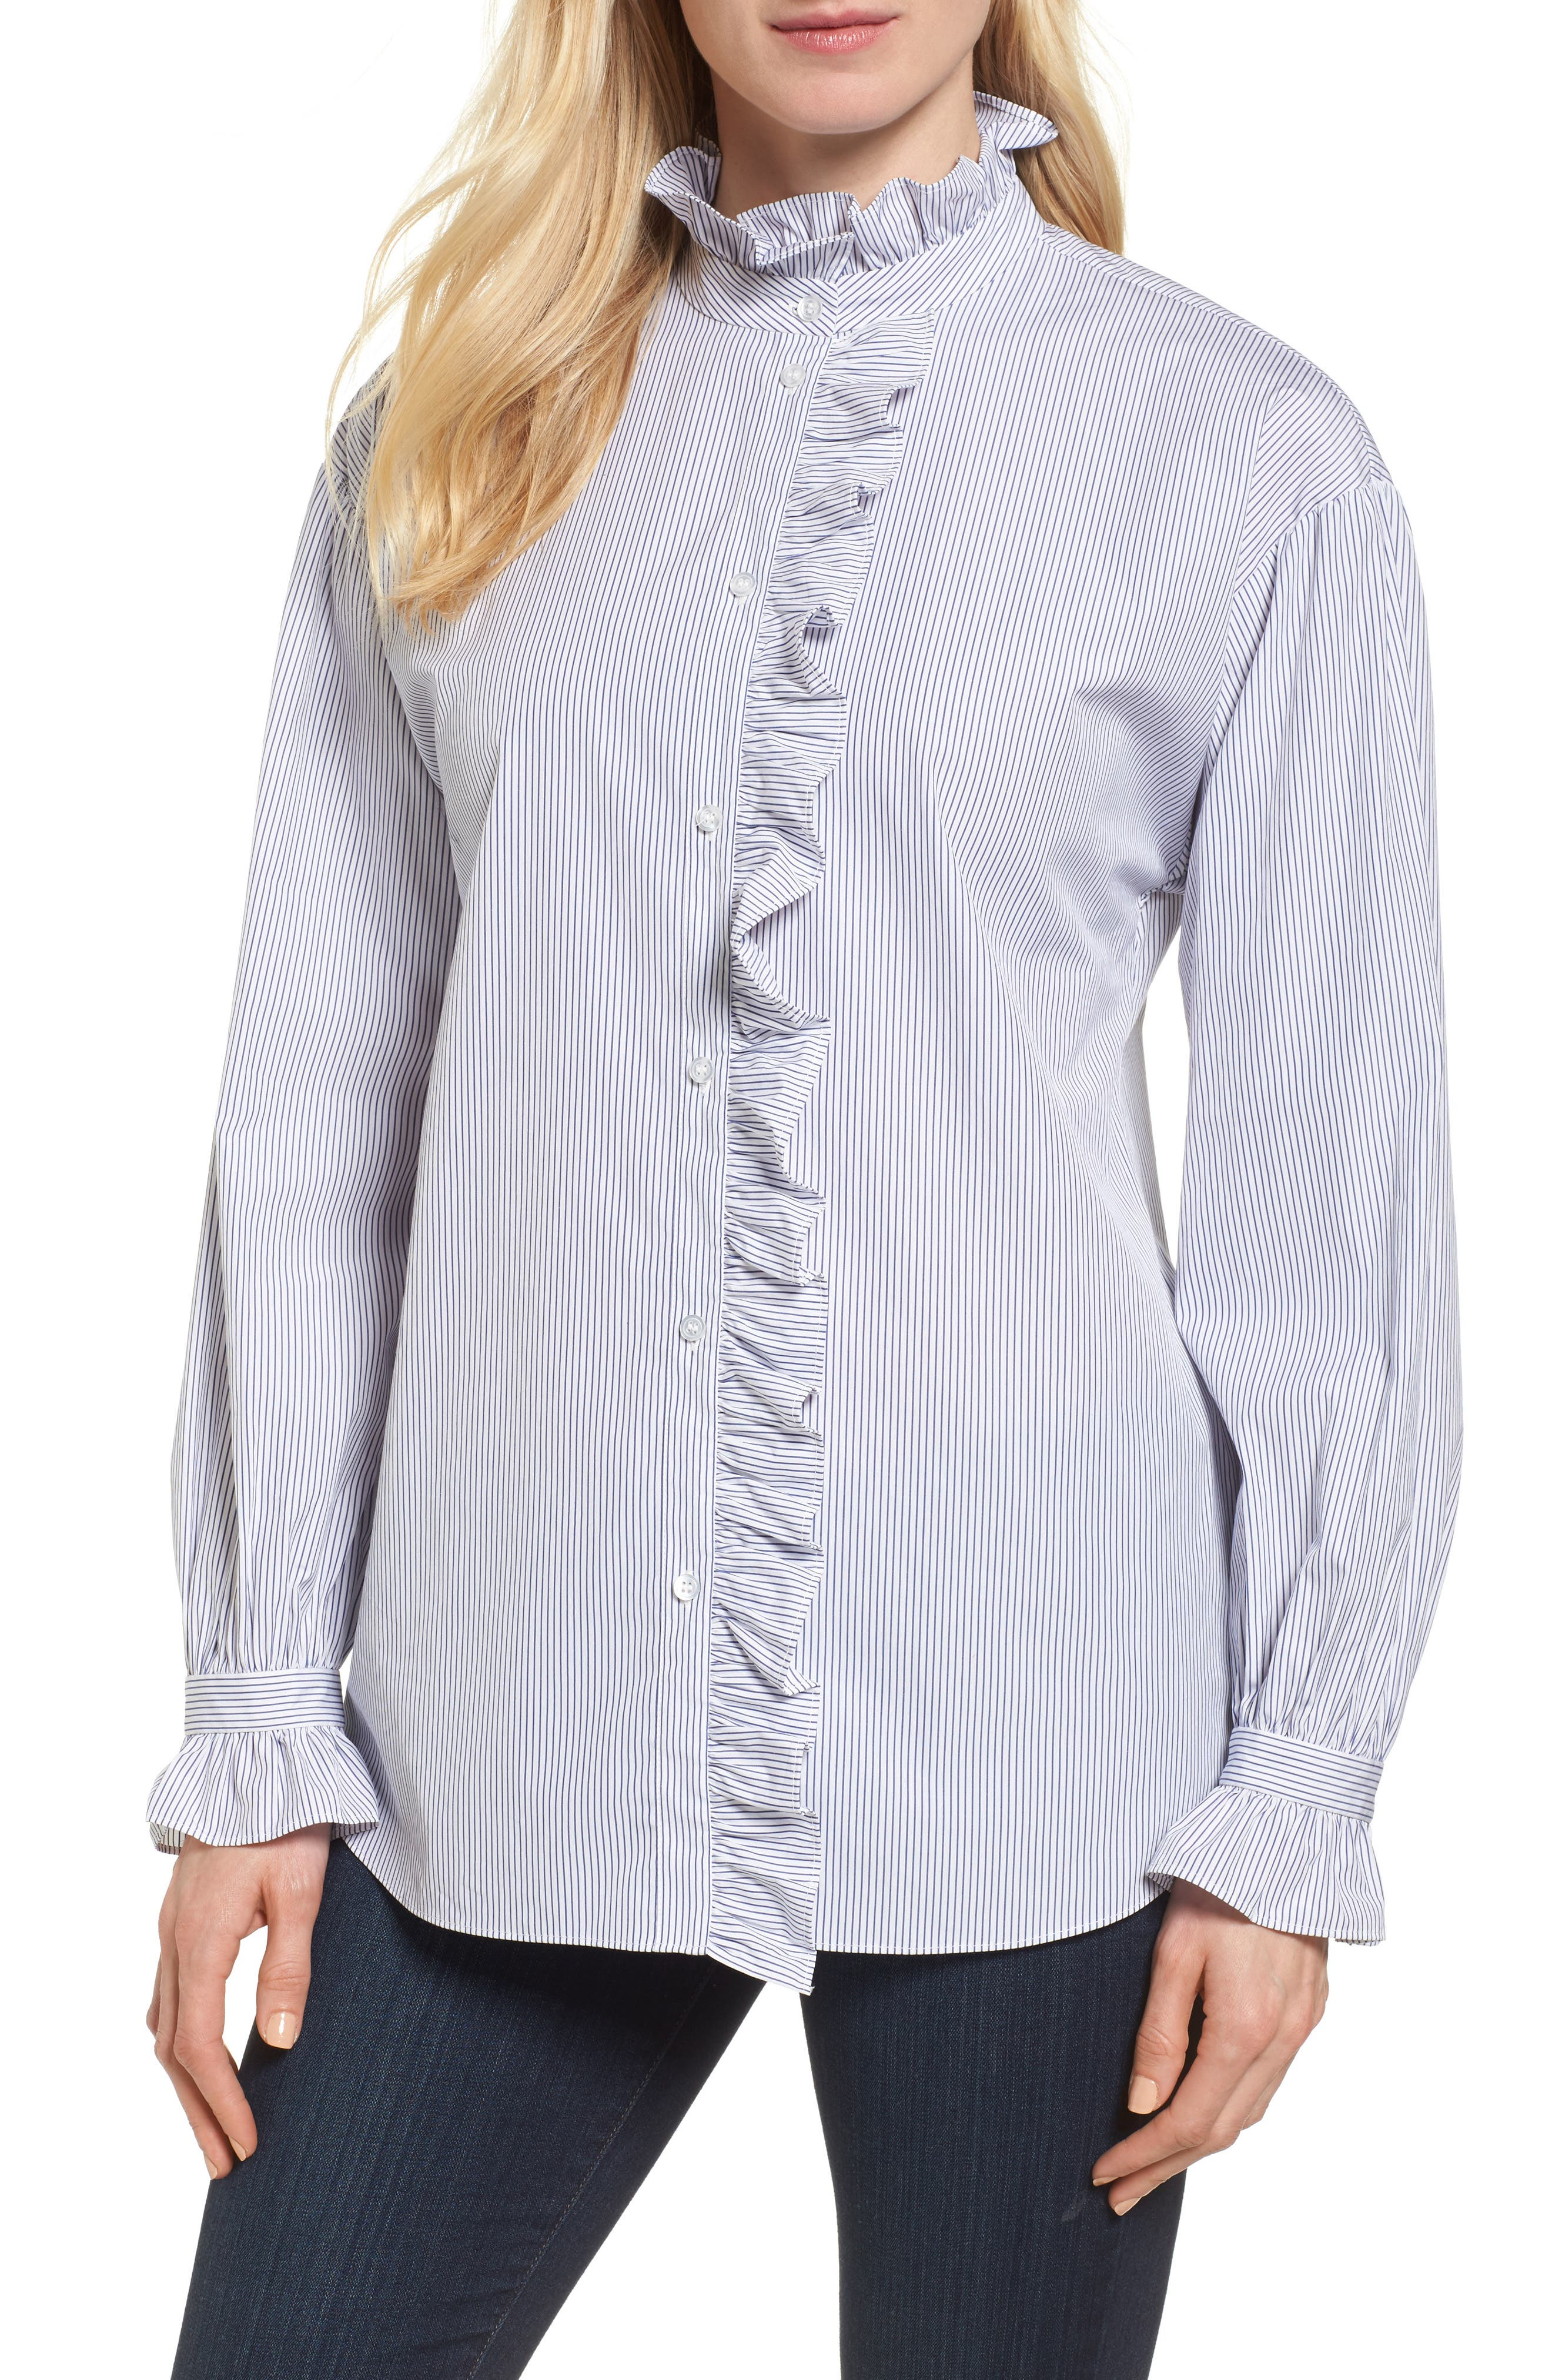 Main Image - Nordstrom Signature Ruffle Stripe Shirt